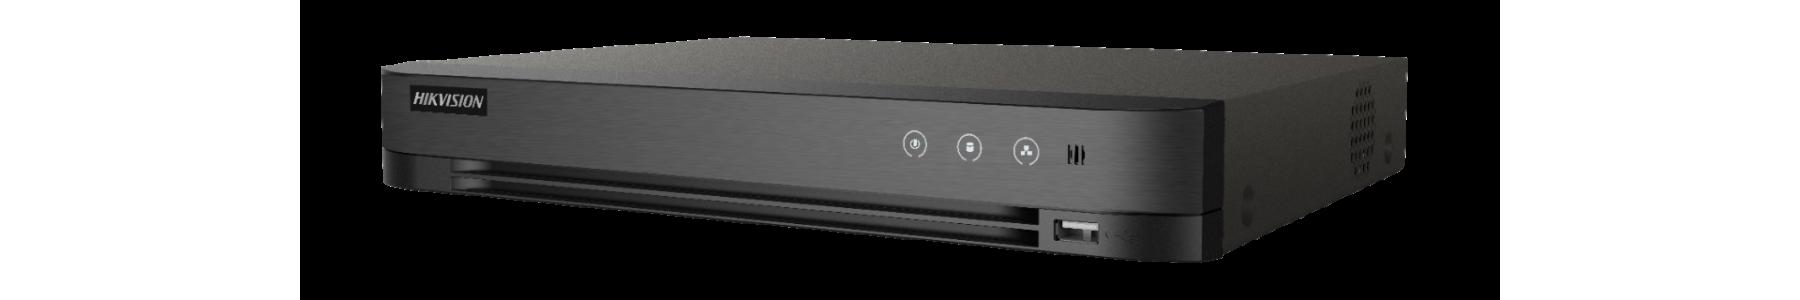 DVR SERIE 7200 HUHI PoC (Power Over Coax) HDD Incluso